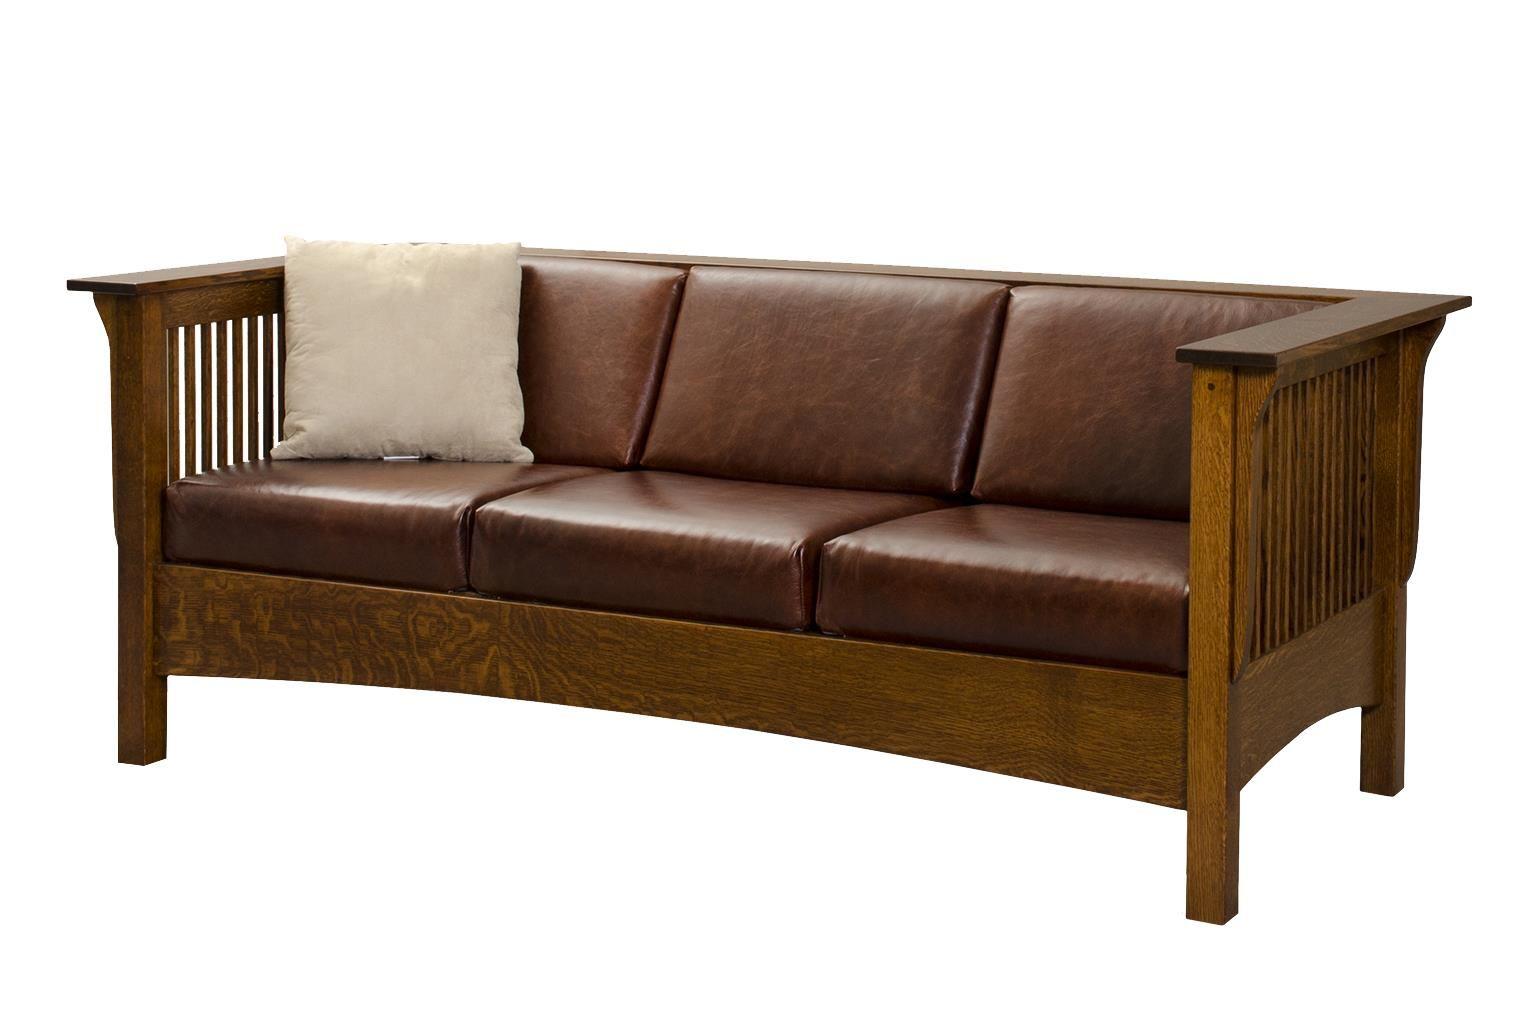 Amish Moon River Mission Sofa Sofa Wood Furniture Living Room